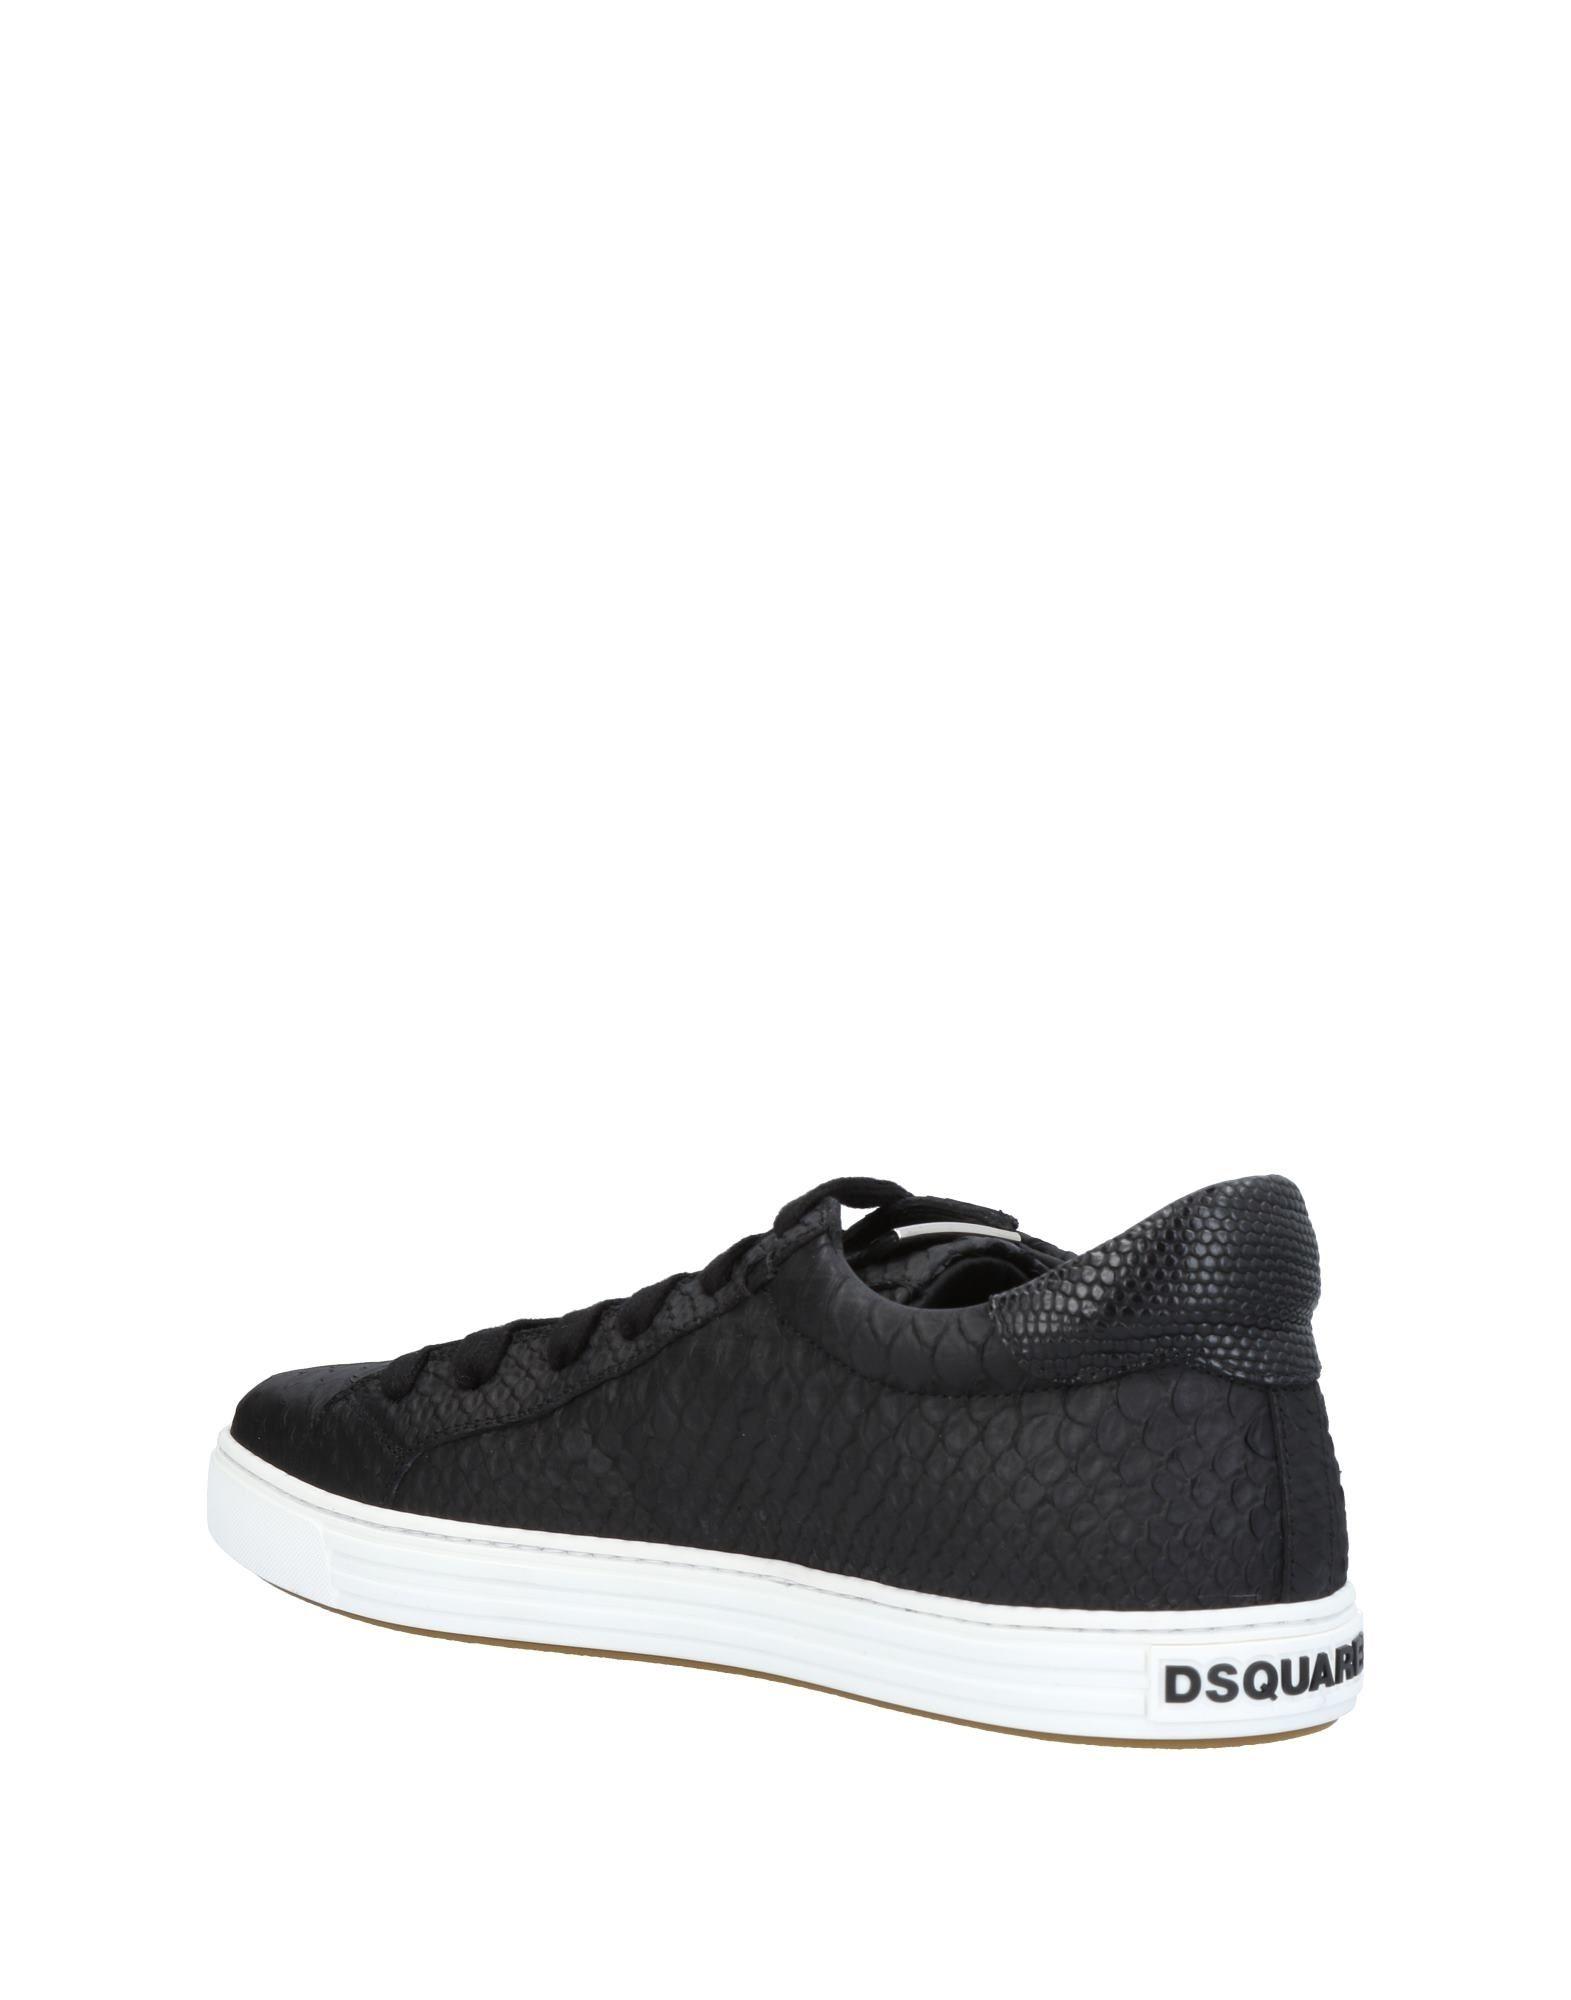 Dsquared2 Sneakers - Men Dsquared2 Sneakers online on  Australia Australia Australia - 11430057HI 34ac16